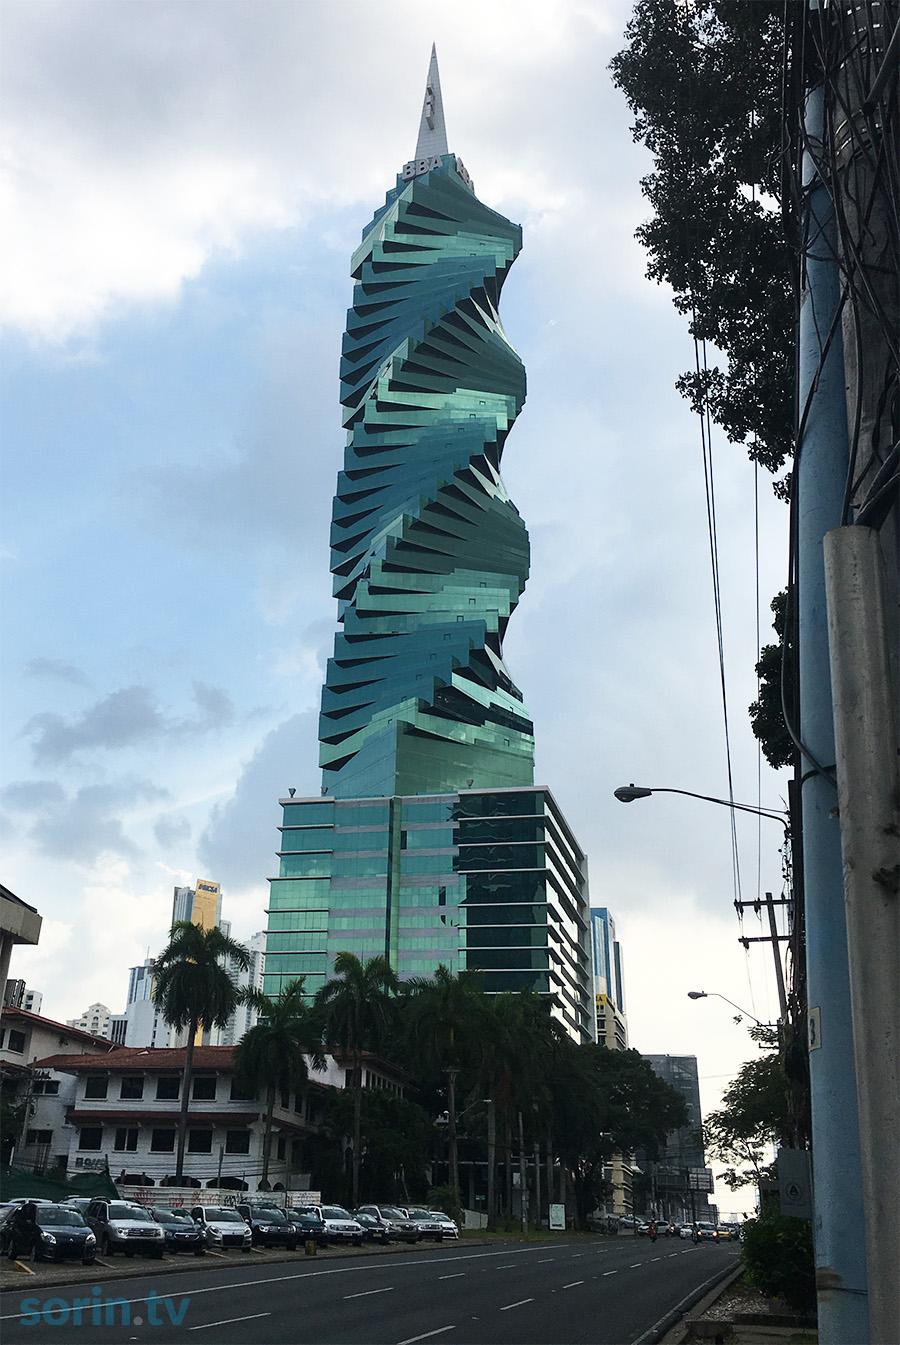 F&F Screw Tower BBA Panama City